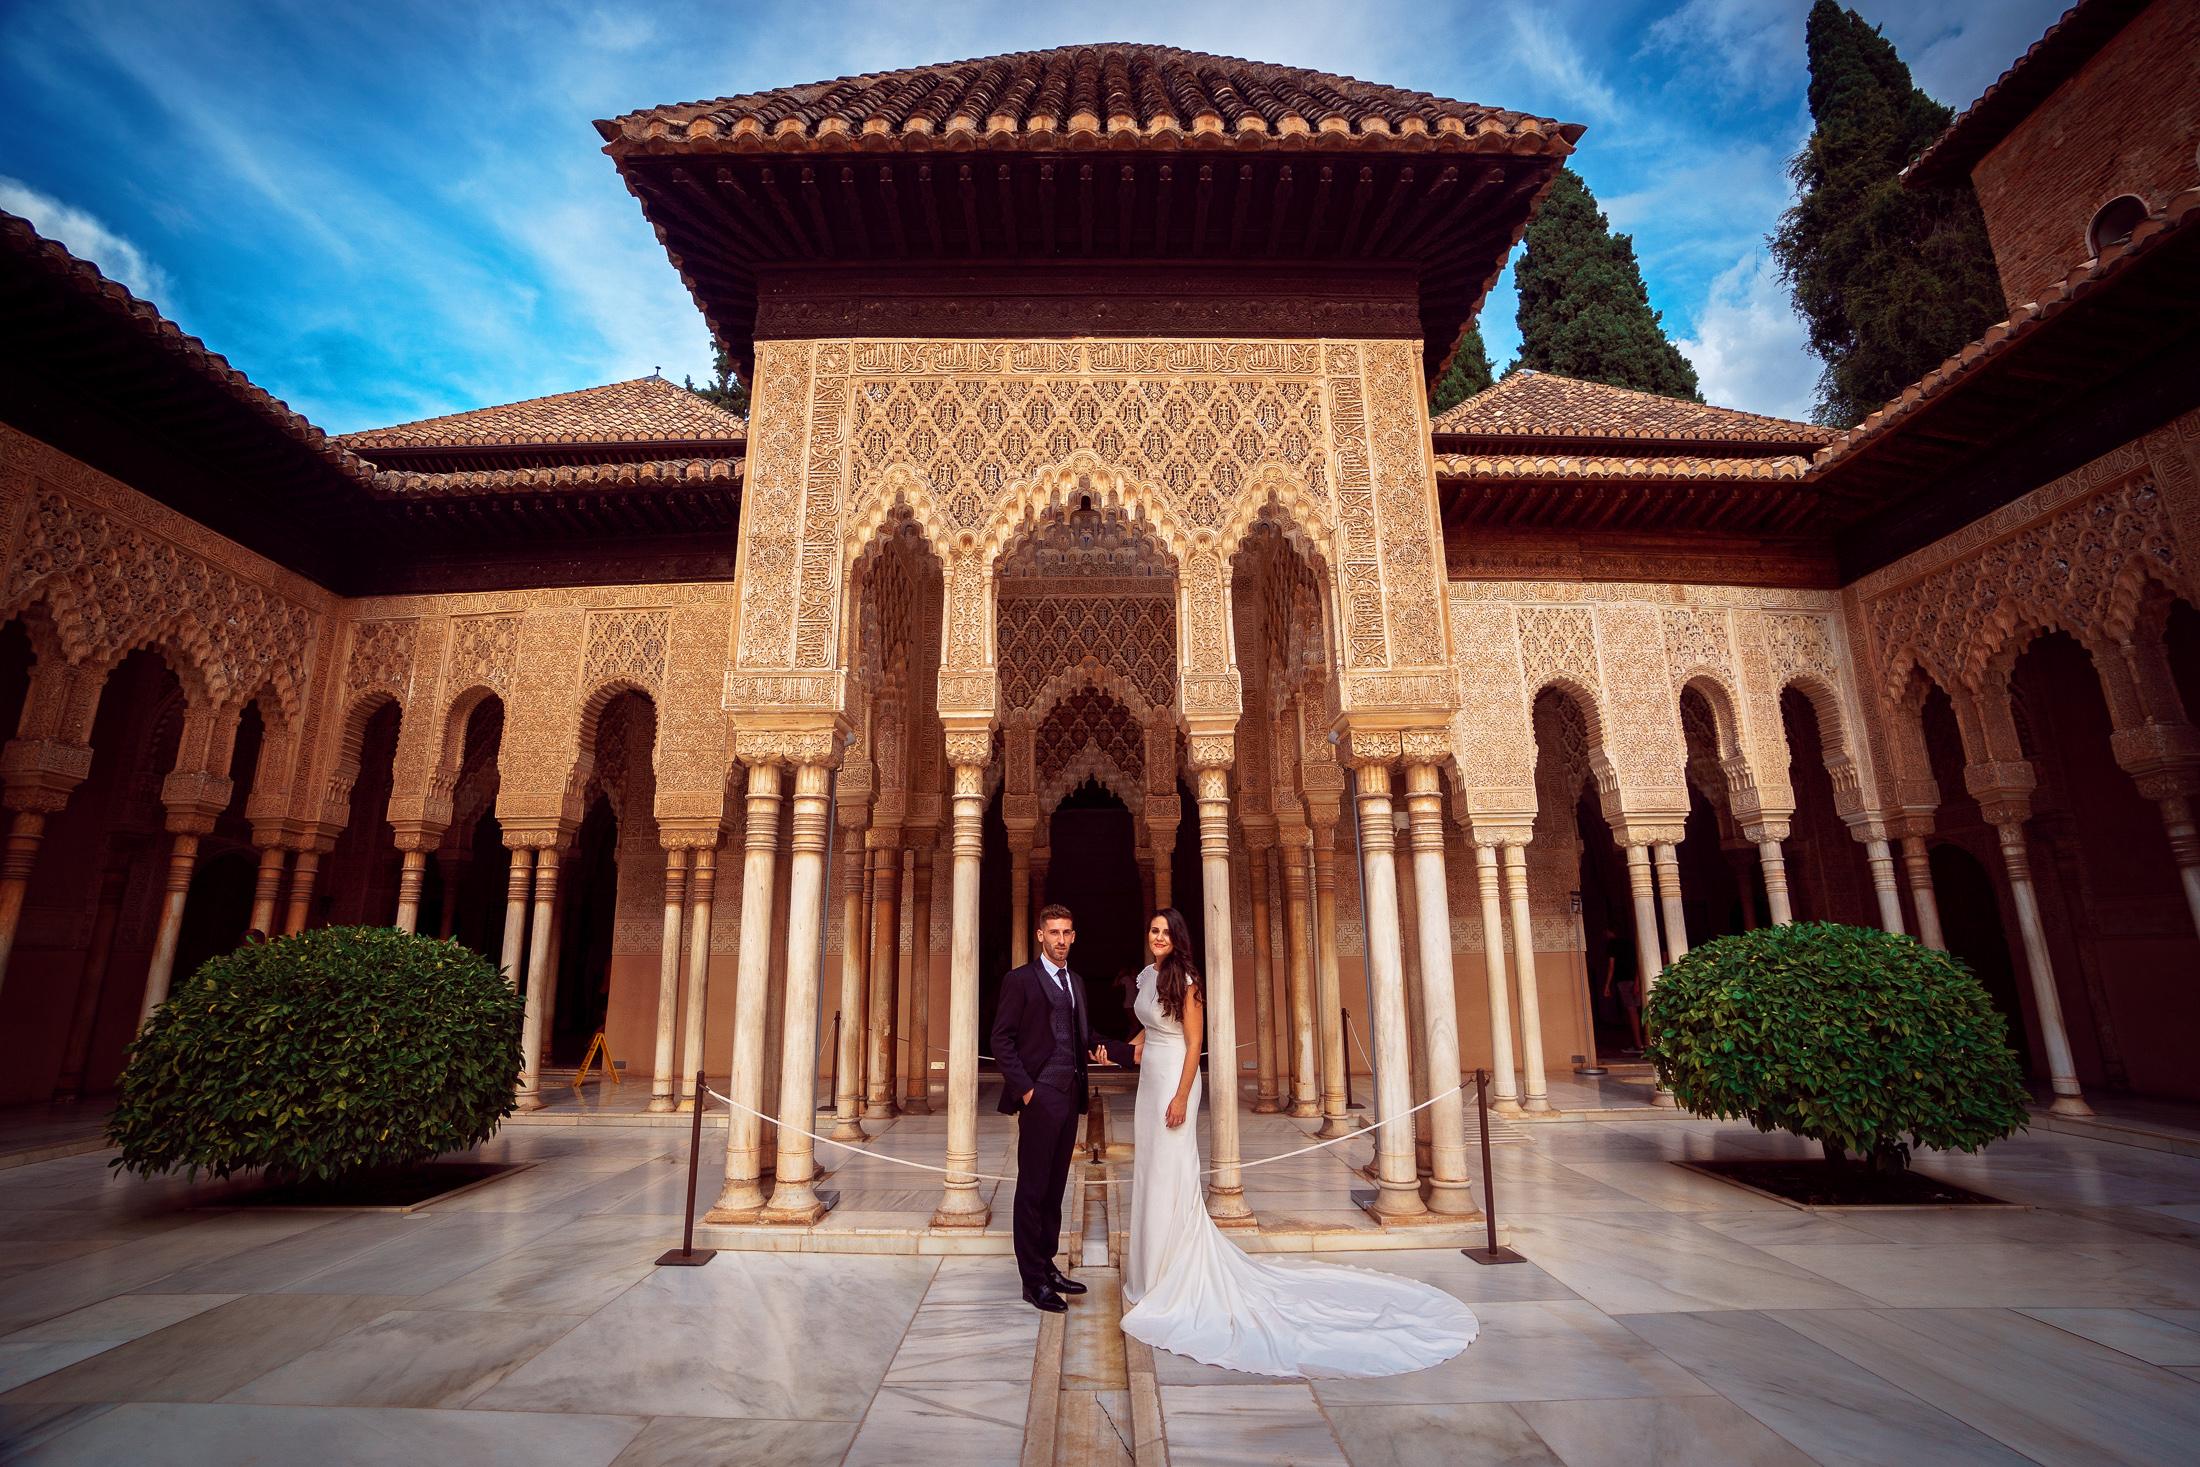 Post boda en Alhambra